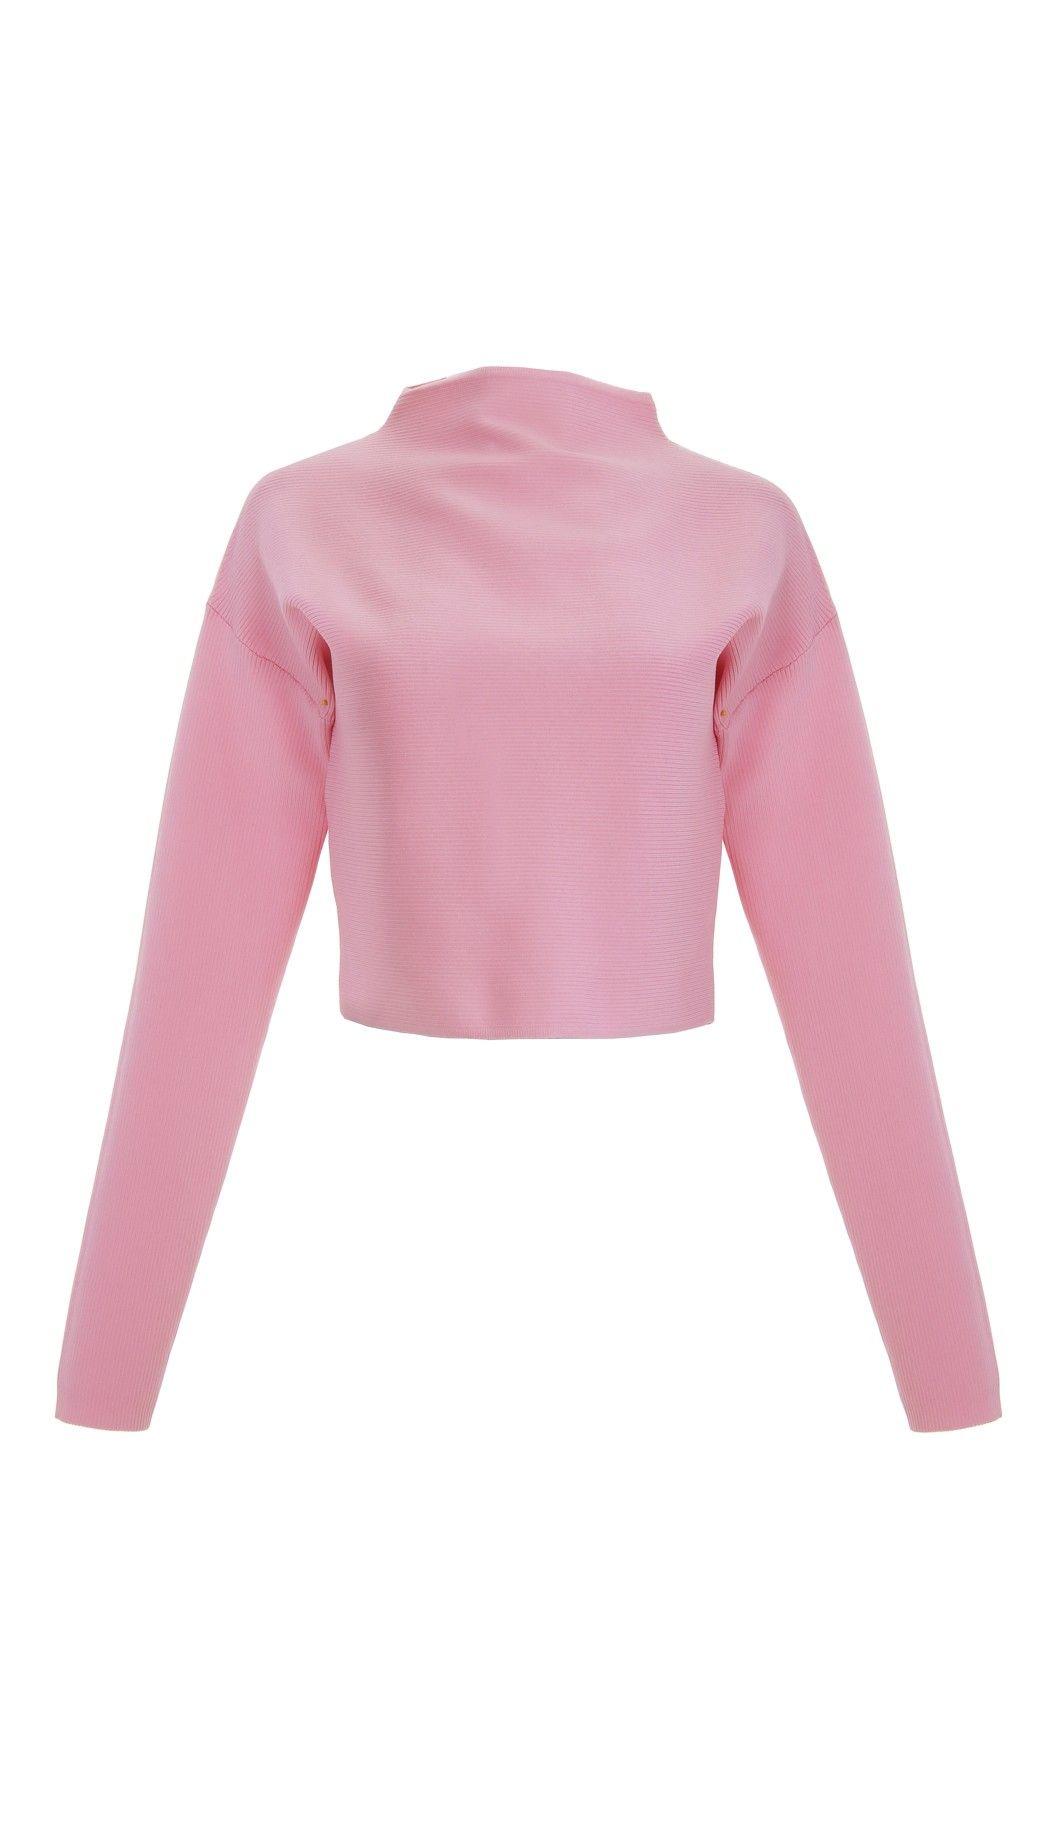 Tibi - Ribbed Mock Neck Cropped Sweater | #MustOwn on Tibi.com ...